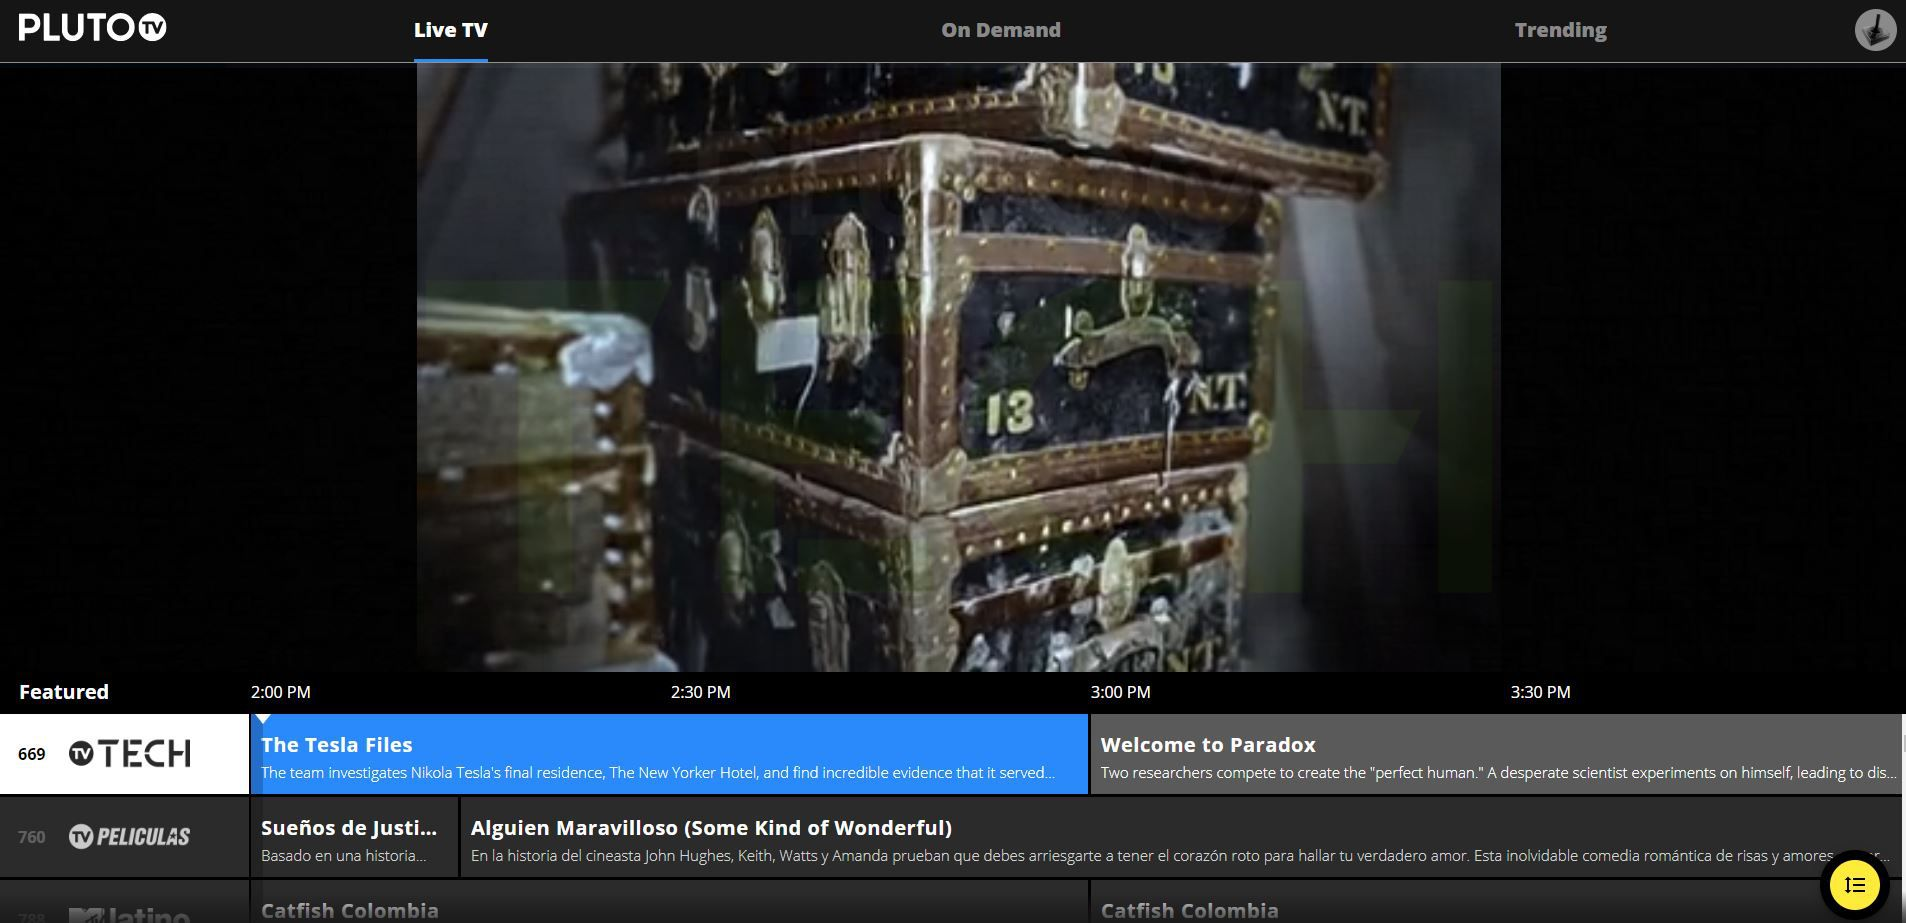 PlutoTV website